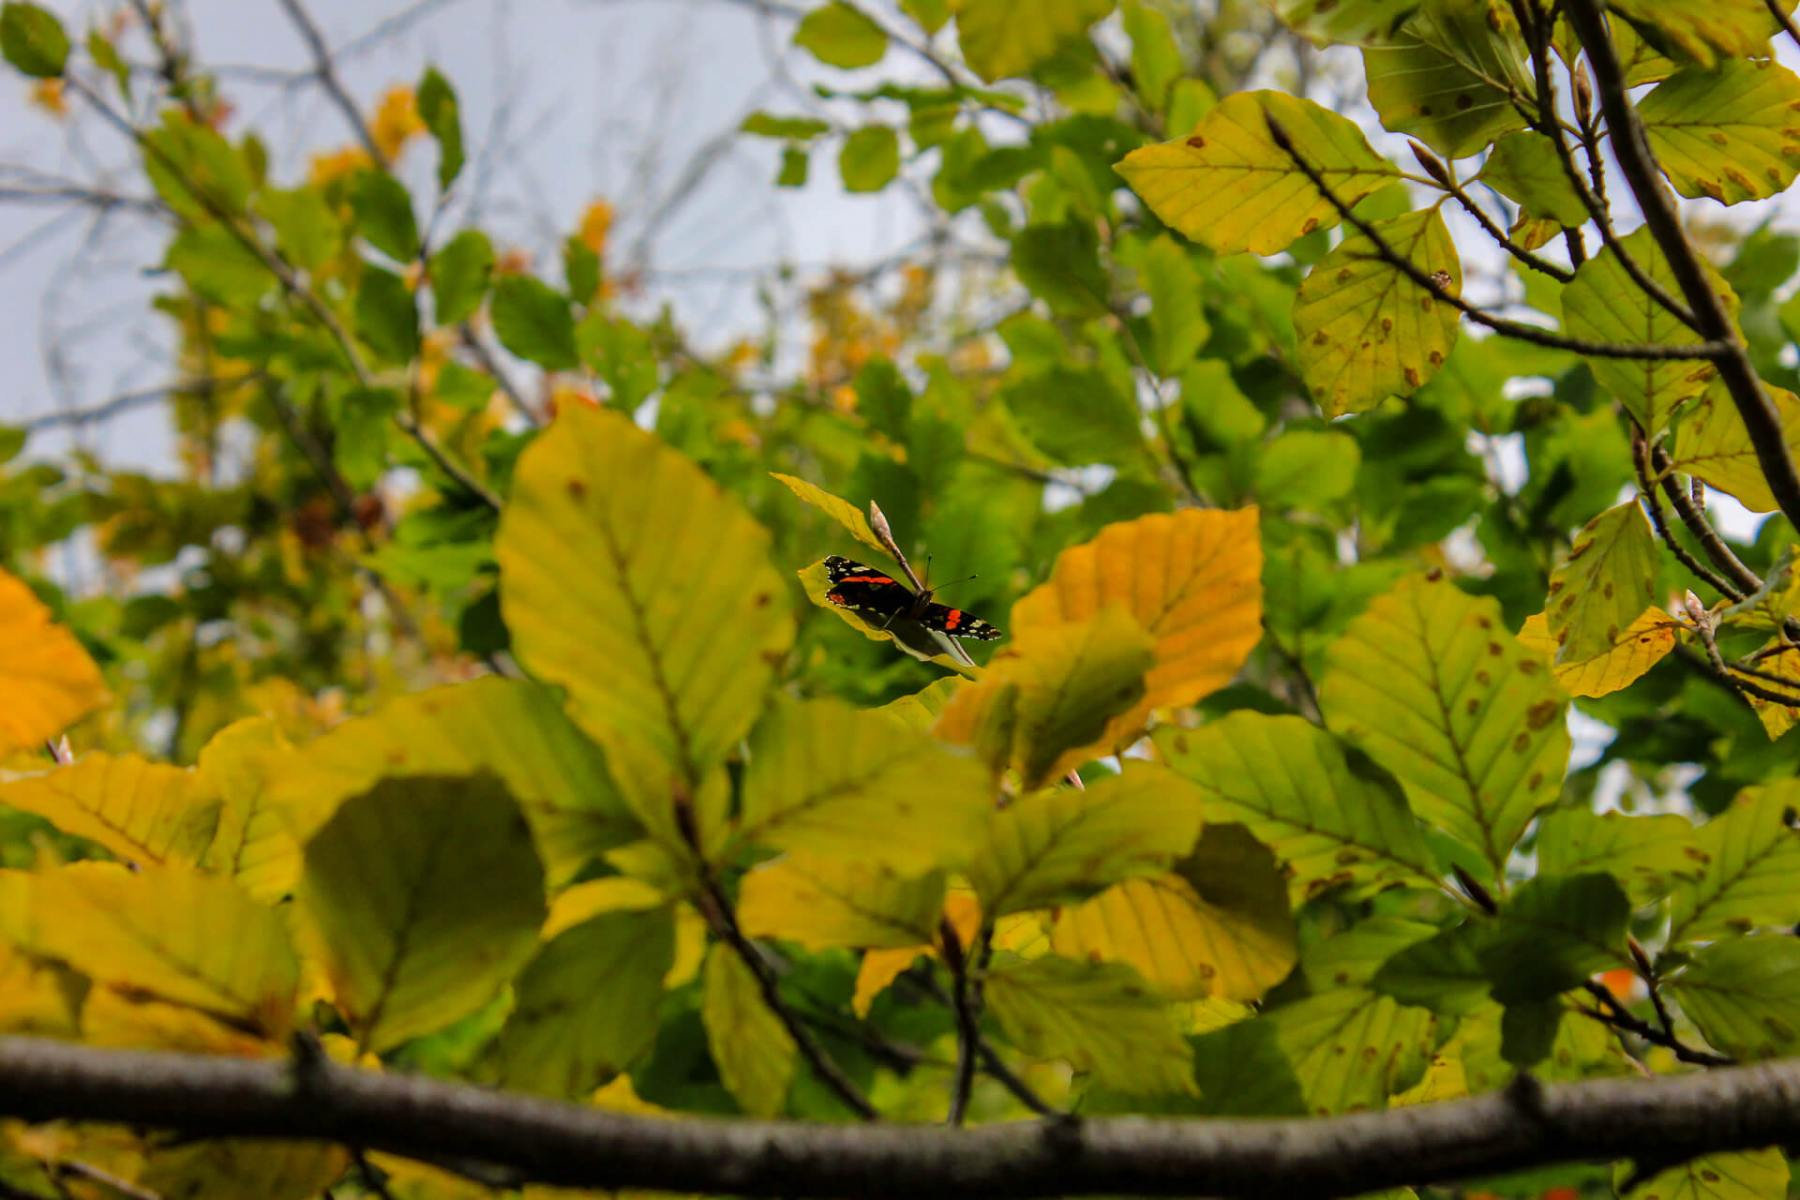 butterfly-upcolse-walk-near-symonds-yat-wye-valley